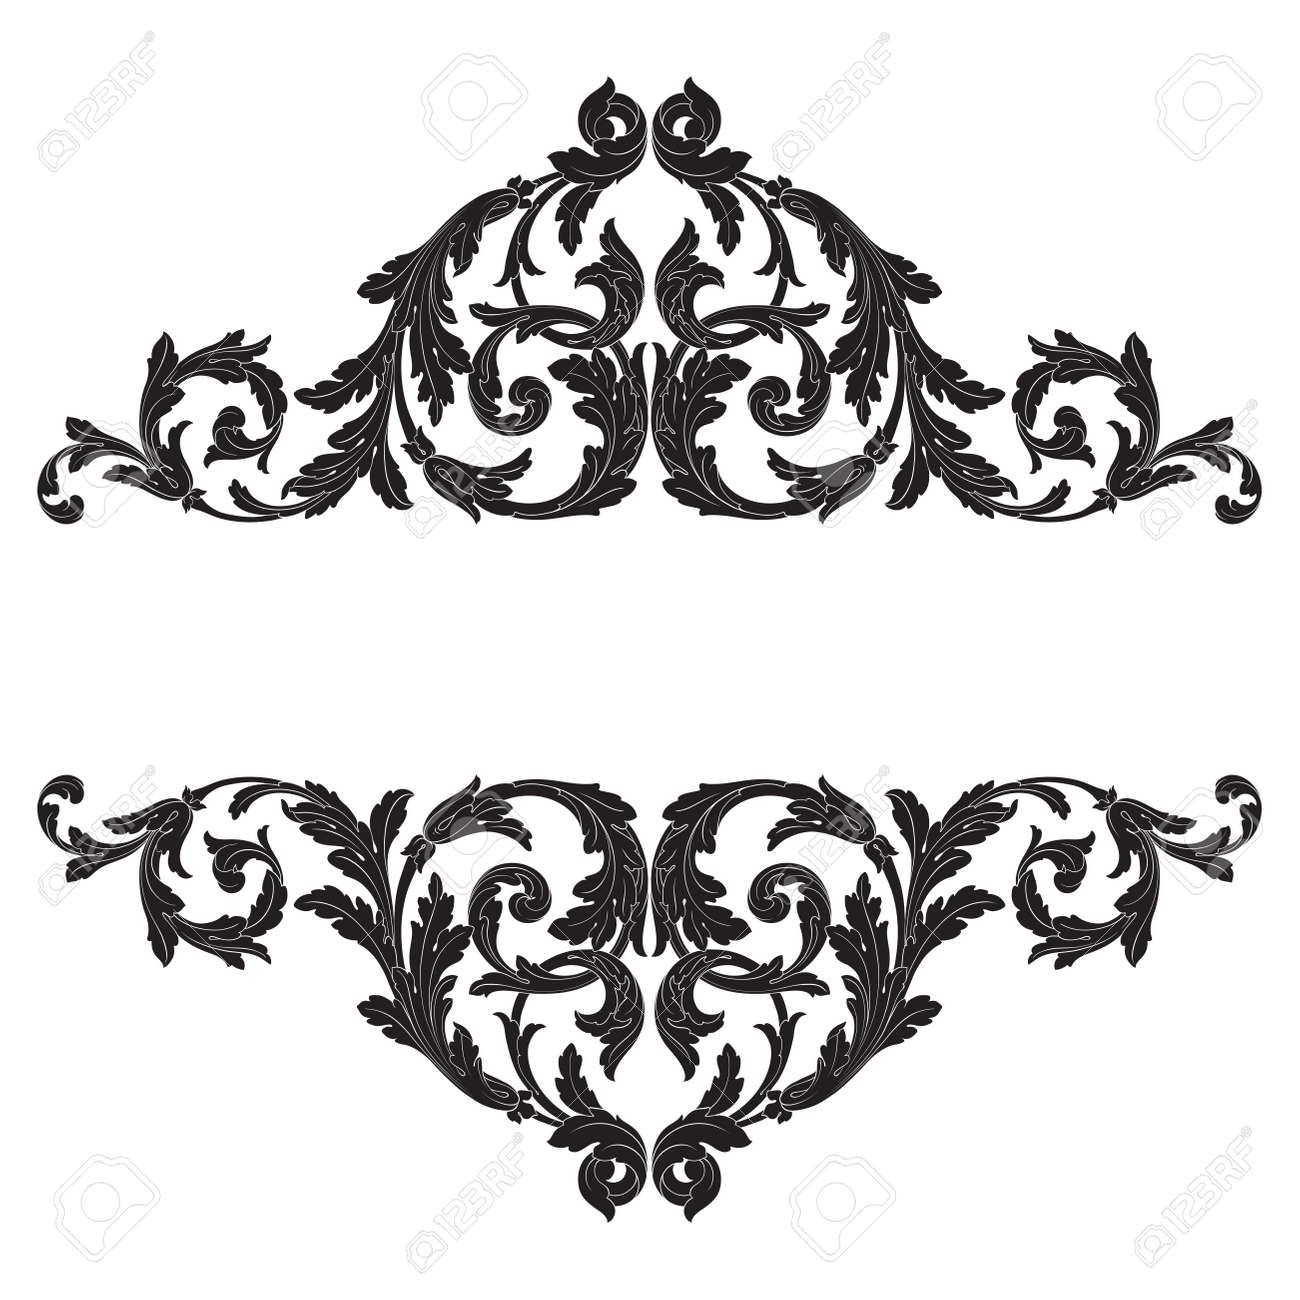 baroque vector vintage elements for design decorative design element filigree calligraphy vector you can